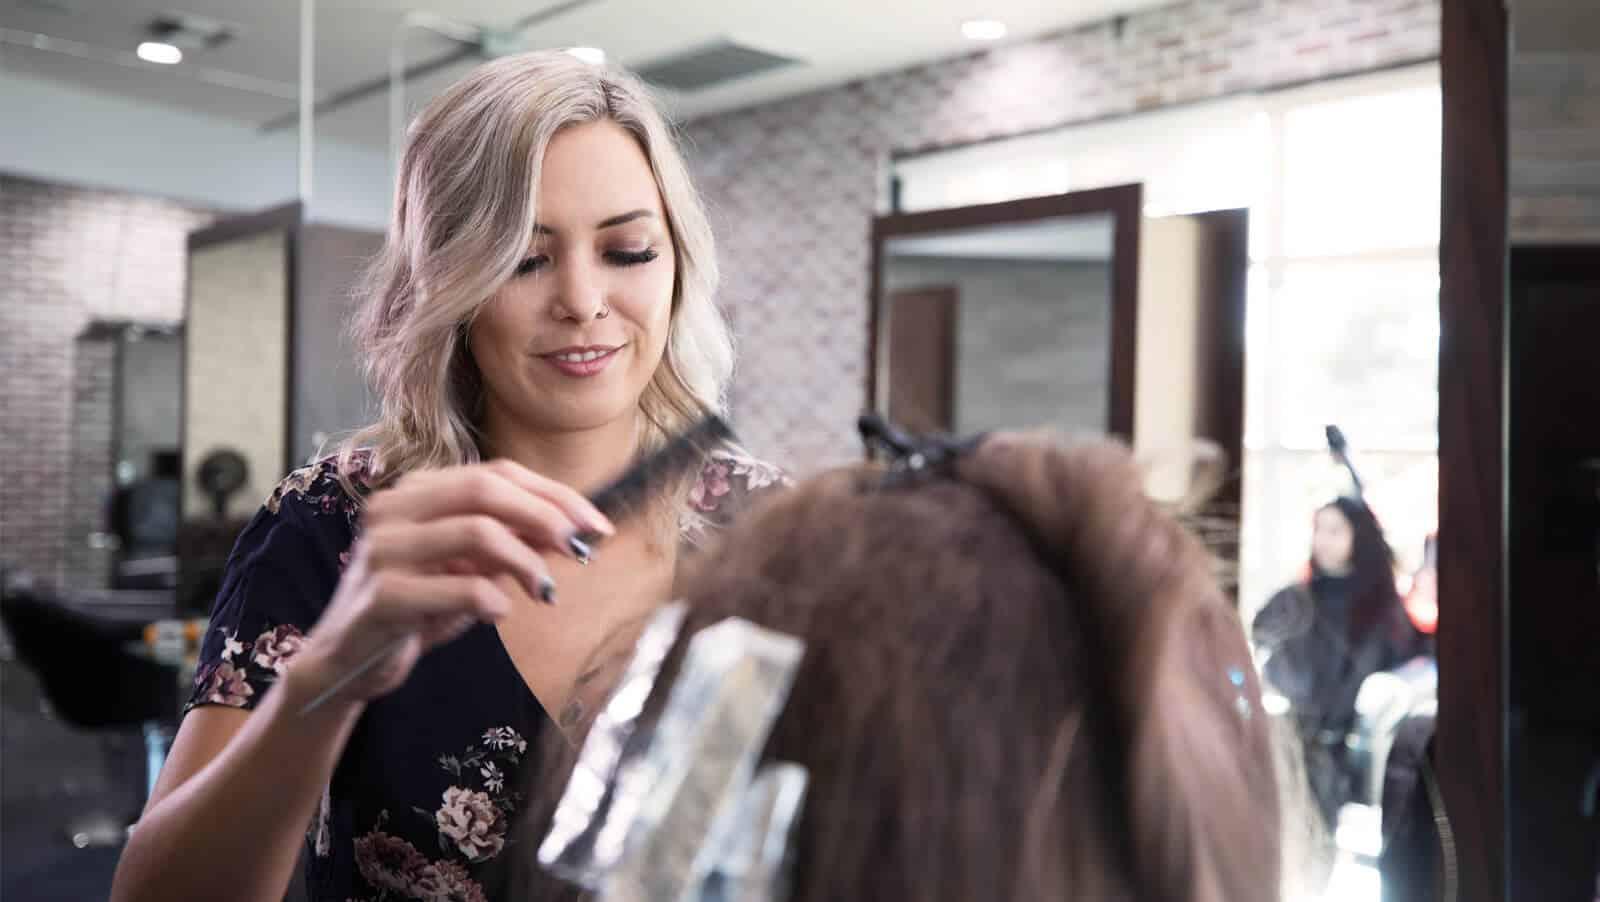 Elena Hansen from The Hair Standard Salon